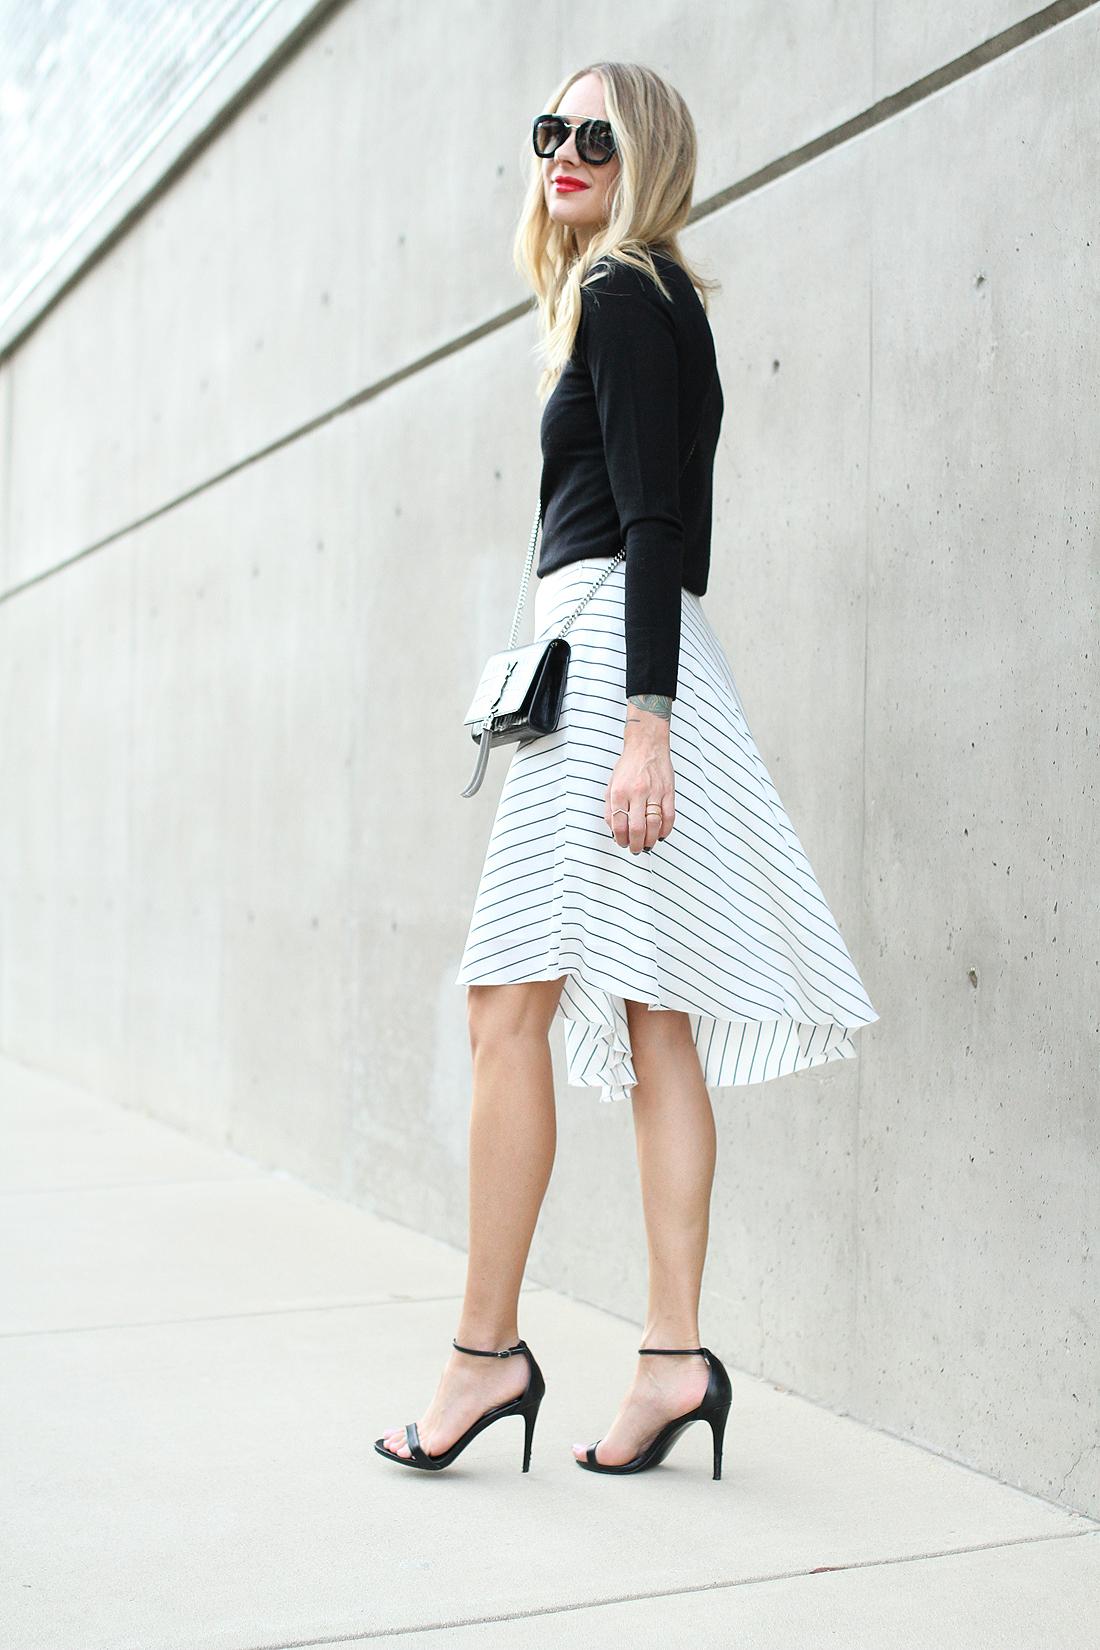 fashion-jackson-club-monaco-white-asymmetrical-skirt-black-sweater-prada-sunglasses-black-ankle-strap-heels